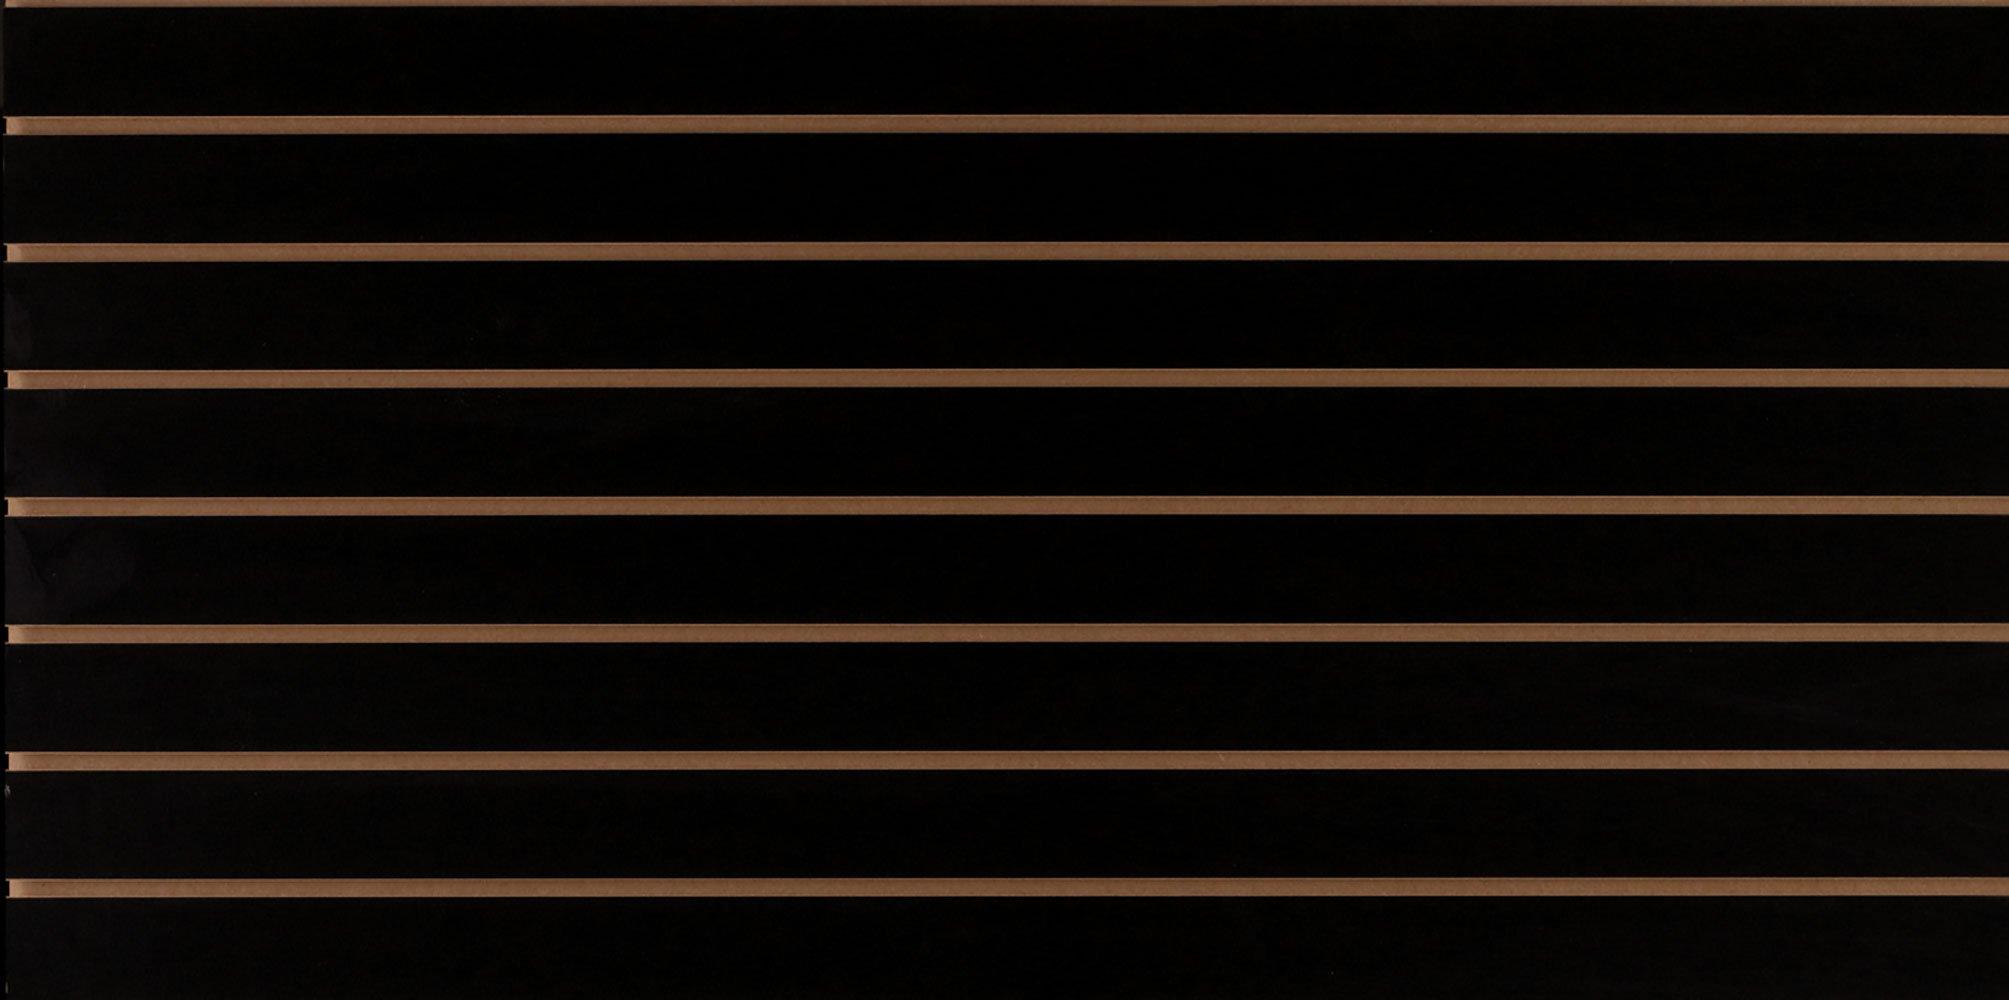 4 x 2 Foot Horizontal Black Slatwall Easy Panels - Pack of 2